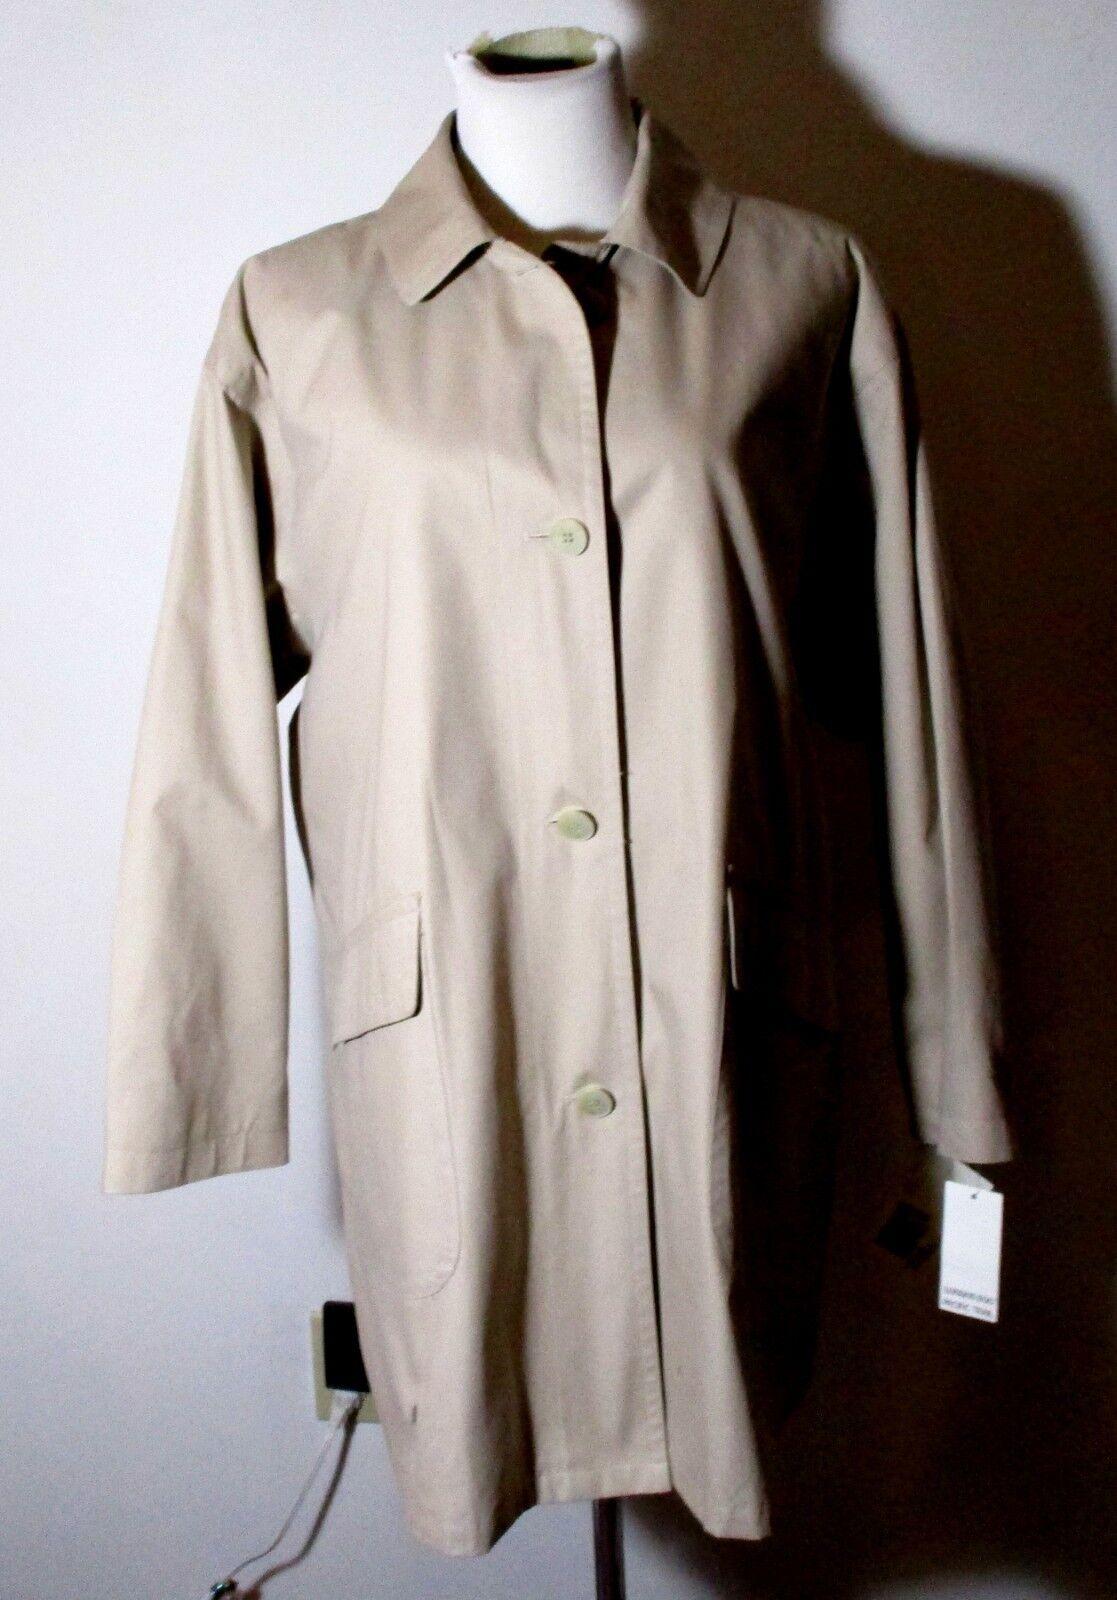 Women's TOWNE by London Fog Beige Mid Length Button Overcoat Size 8 Reg. NWT